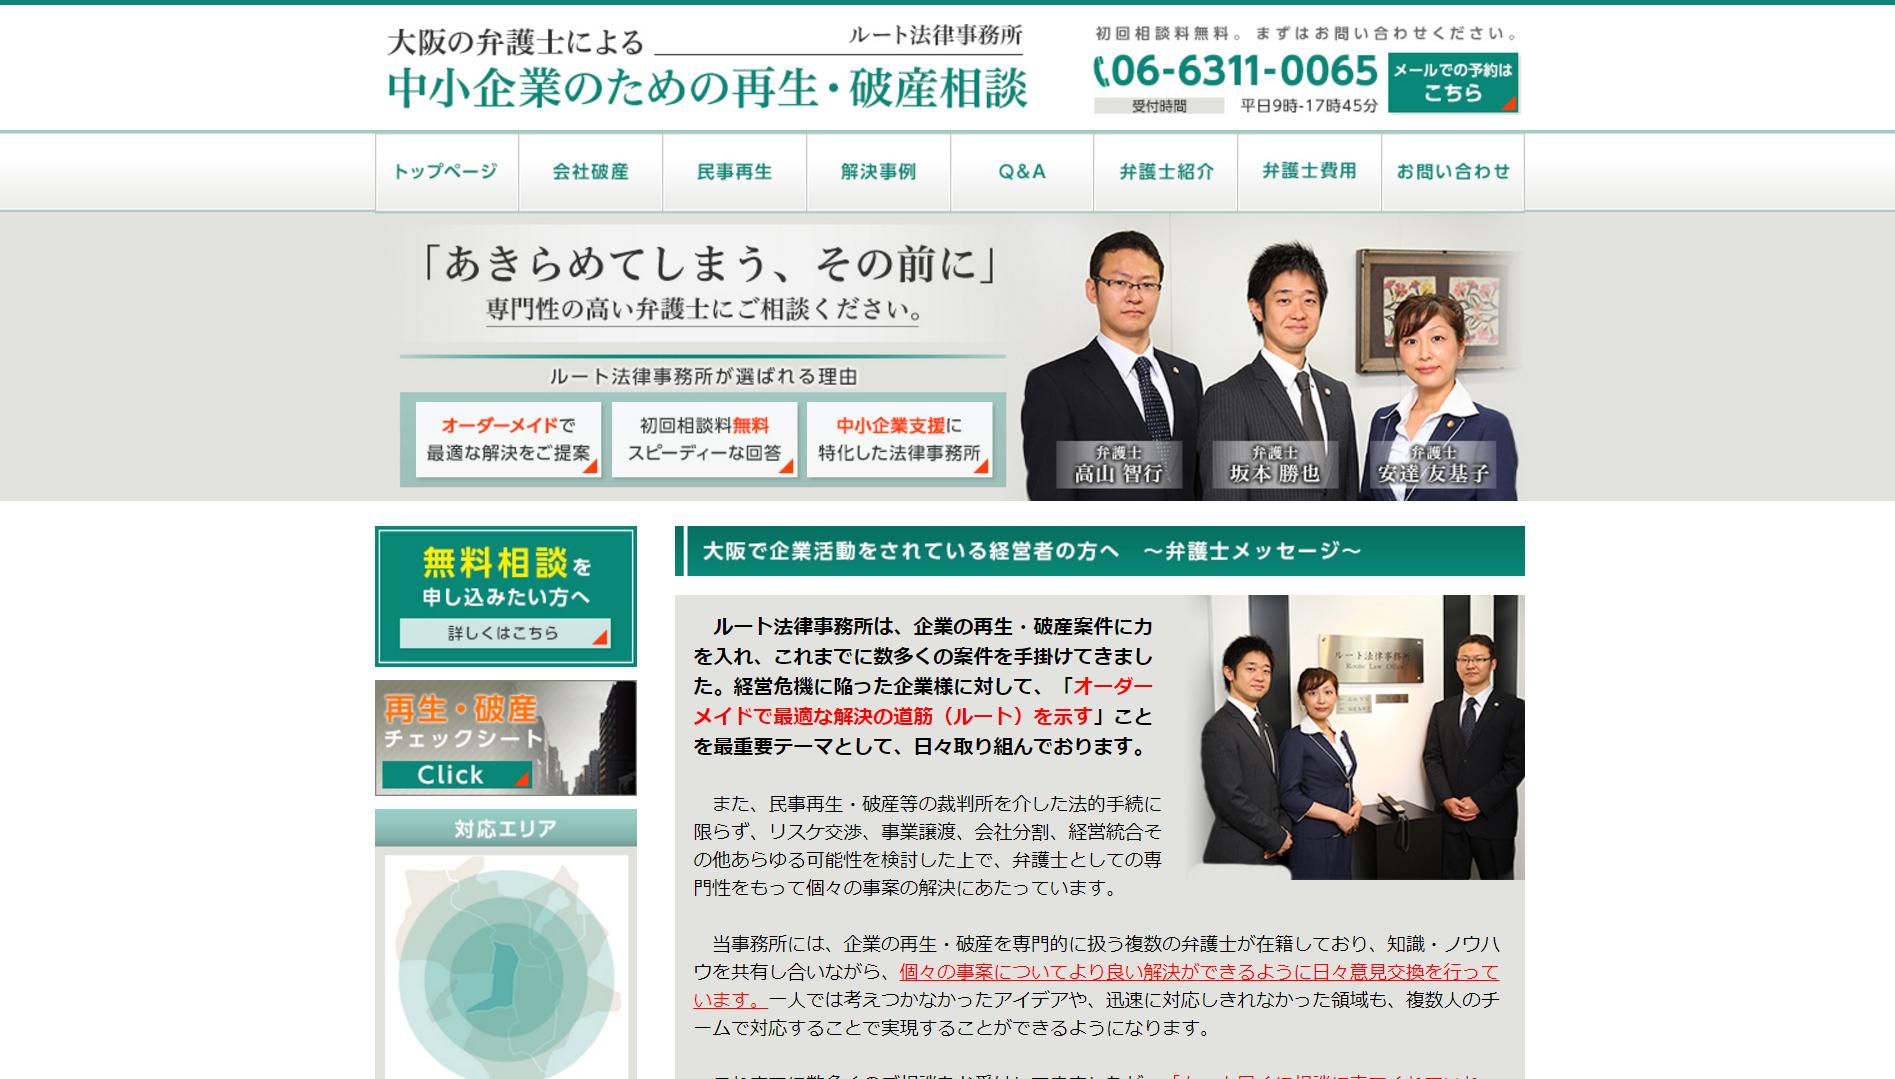 ルート法律事務所(大阪府大阪市北区)